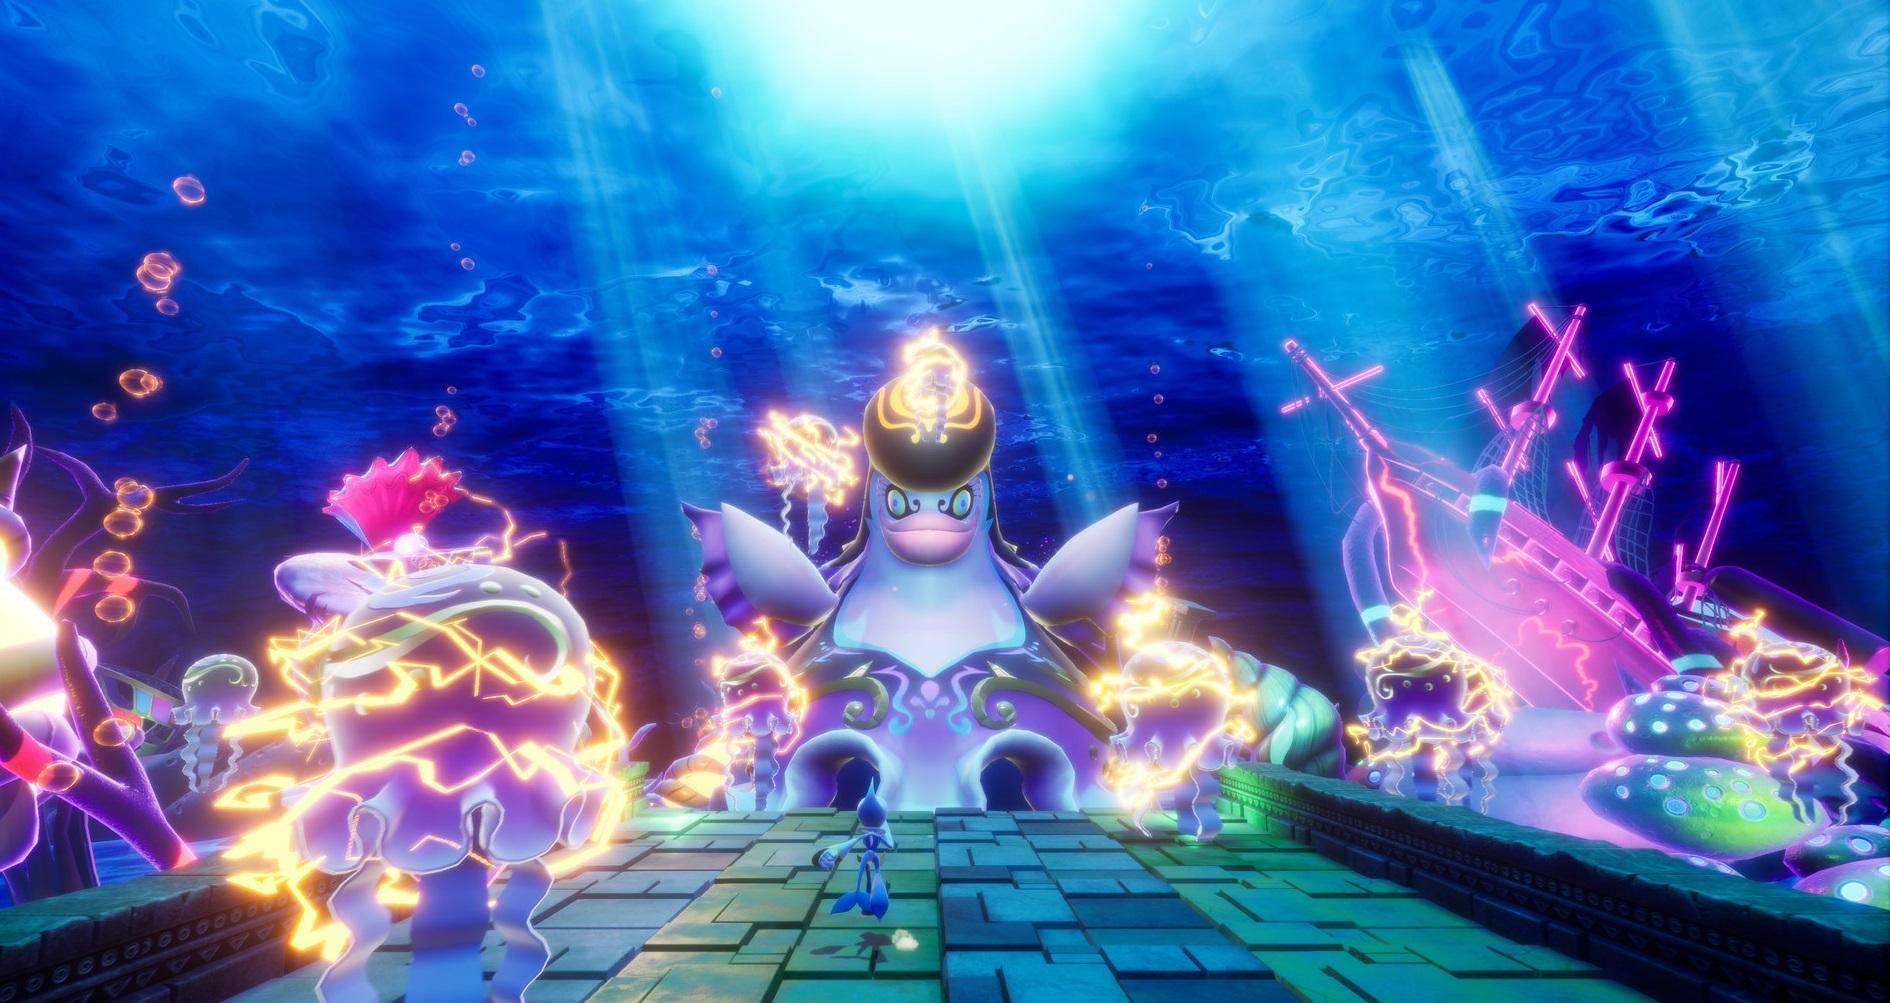 The hits keep coming: Square Enix is taking down the Balan Wonderworld demo